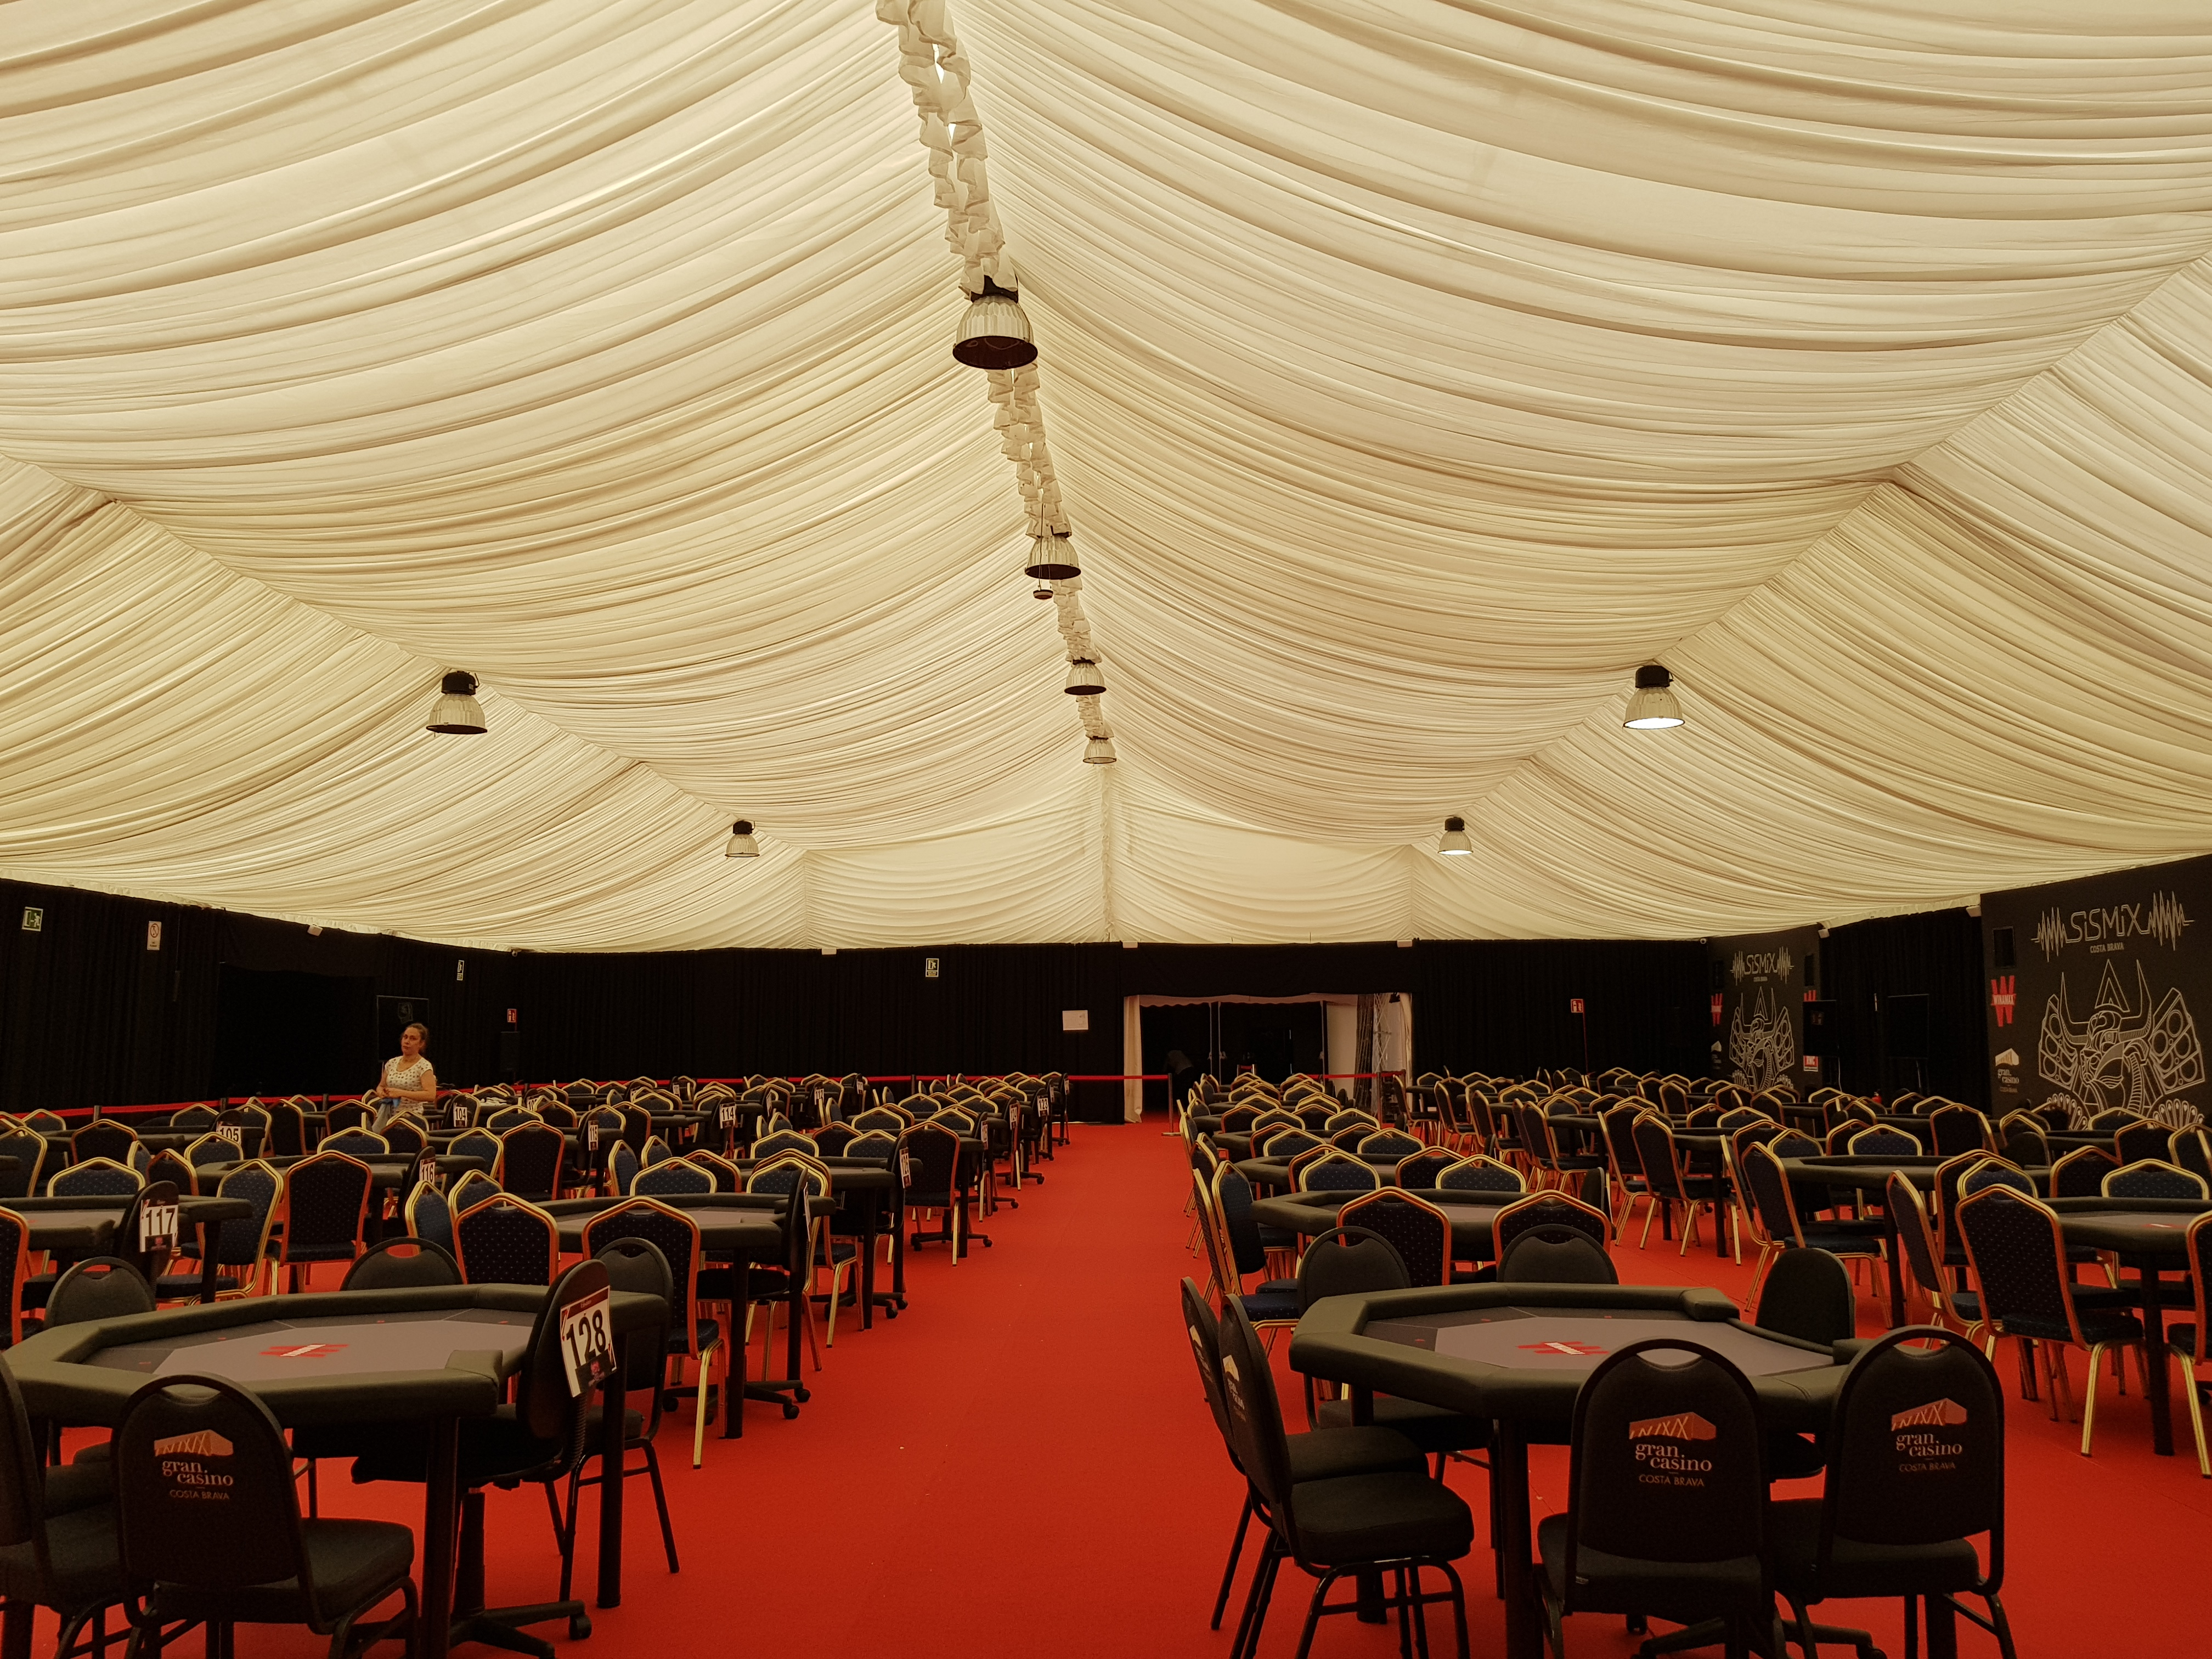 Evento CasinoLloret1 20x40 + 10x15